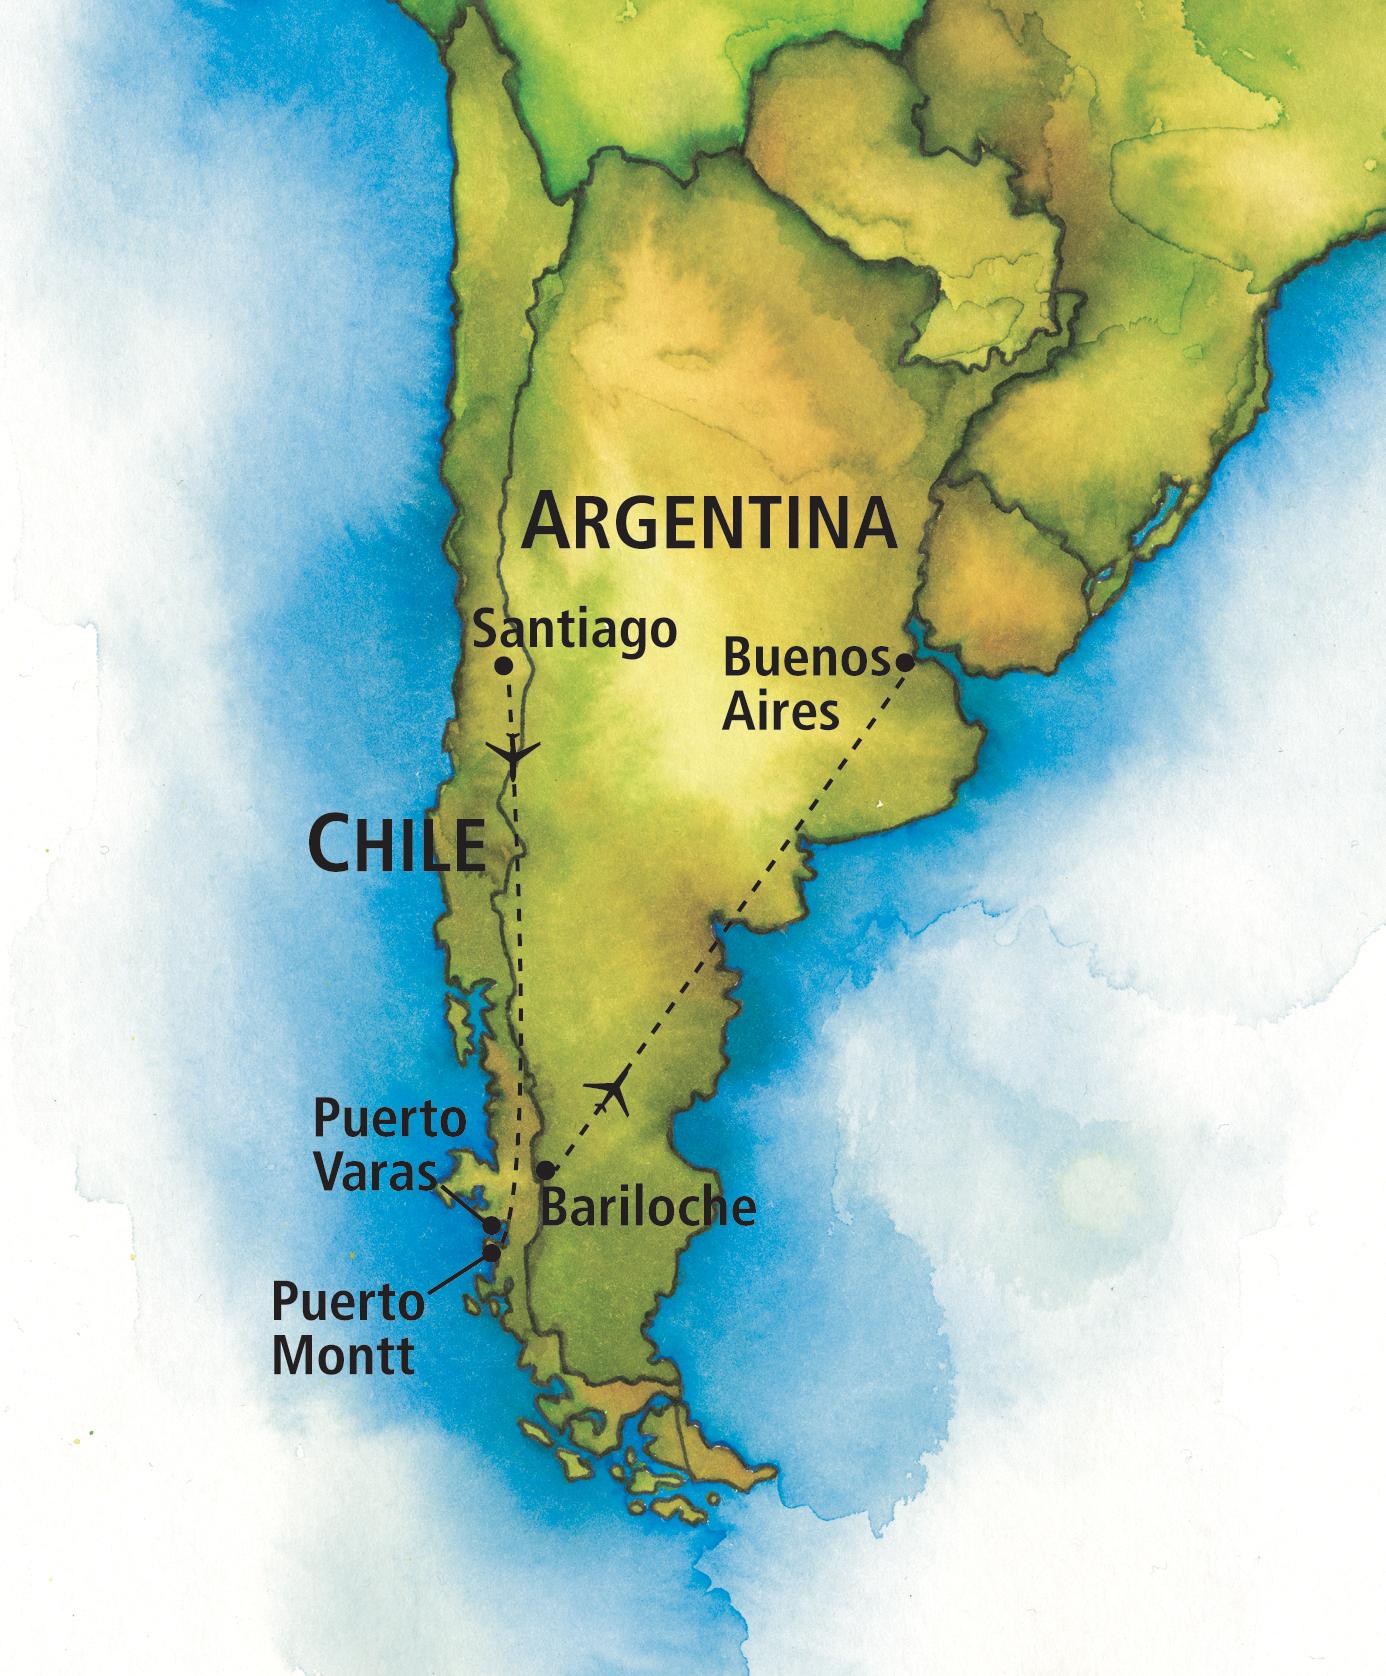 Portrait Of Chile And Argentina The Ohio State University Alumni - Argentina chile map